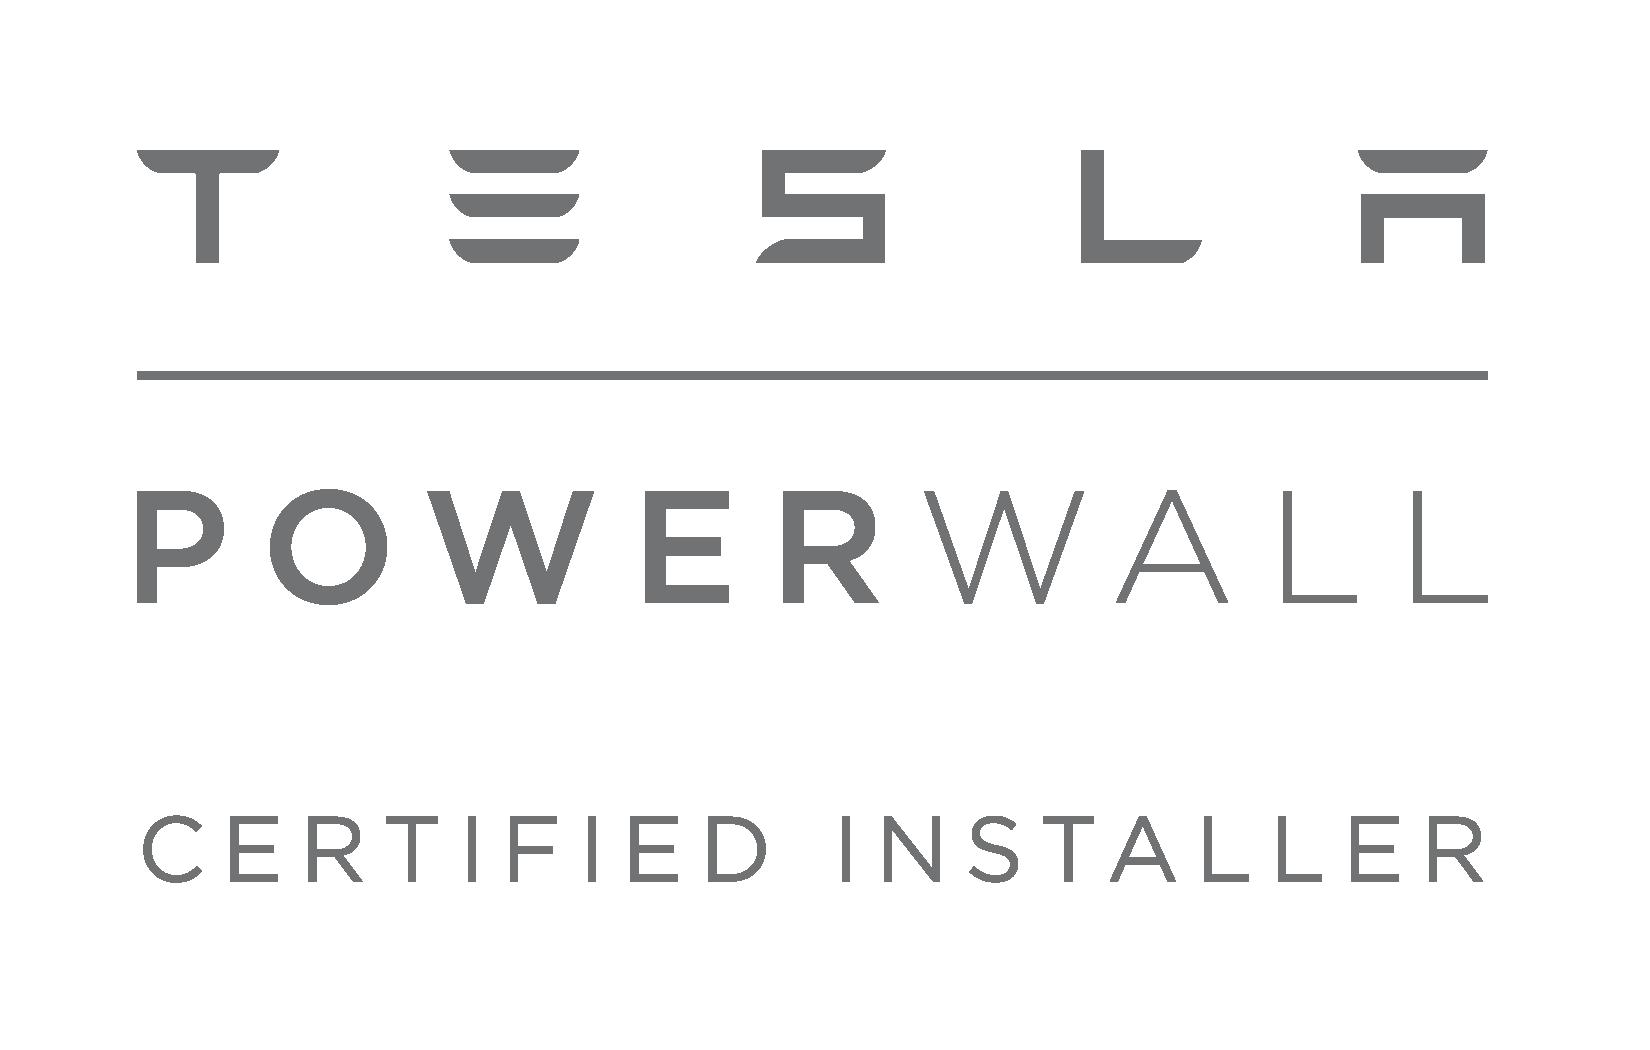 Tesla Powerwall Certified Installer Logo or4xfjvff14oxdzw5ckvitrknbn9j77qst68ls1jlw - Solar Energy in Layman's Terms - Part Two